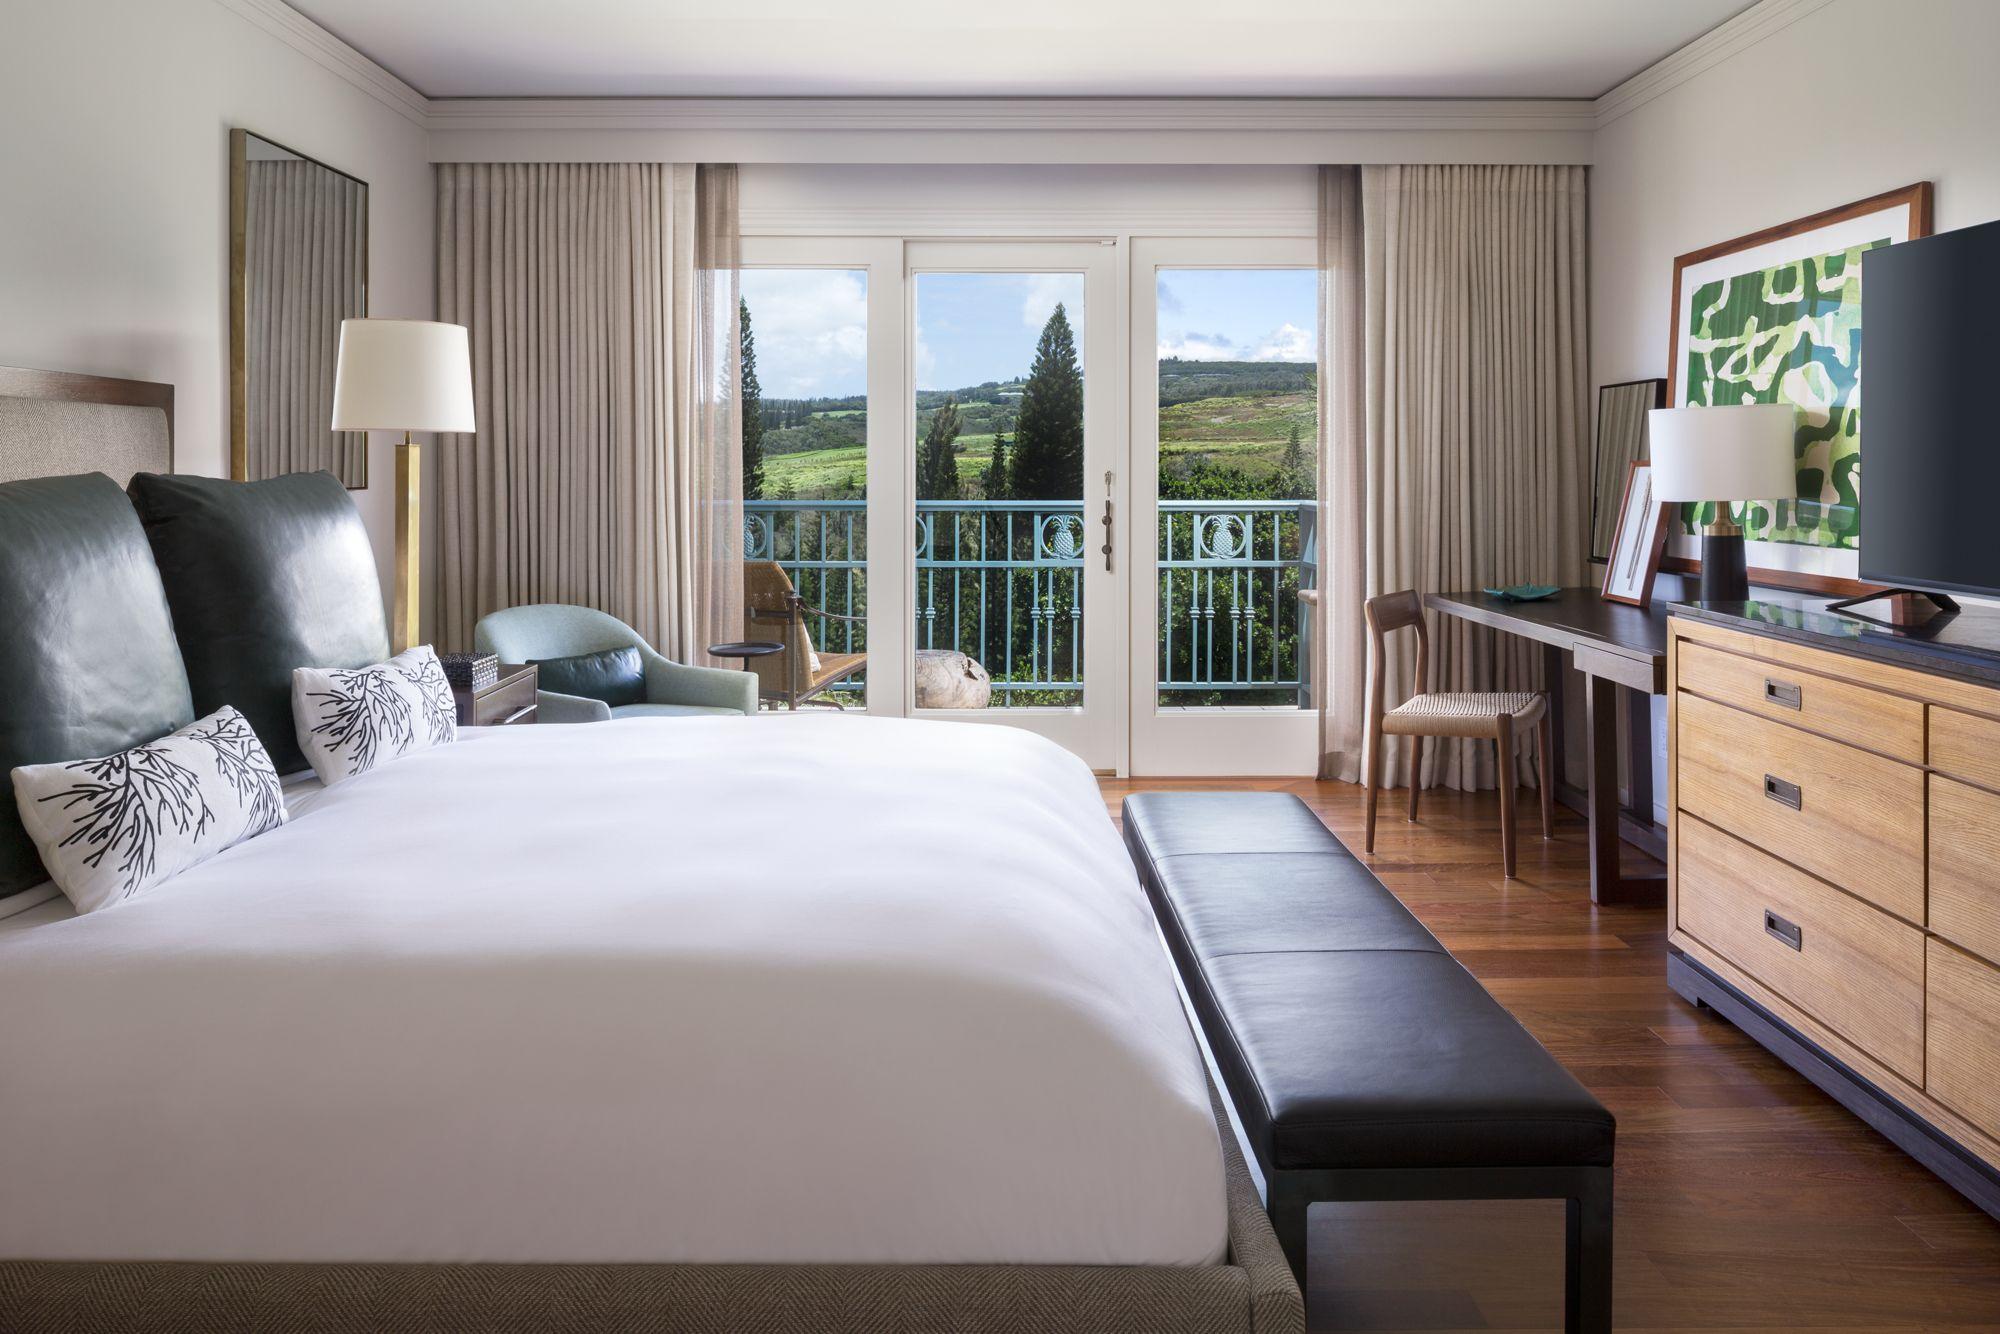 Fiji-Travel-Network-Ritz-Carlton-Kapalua-12